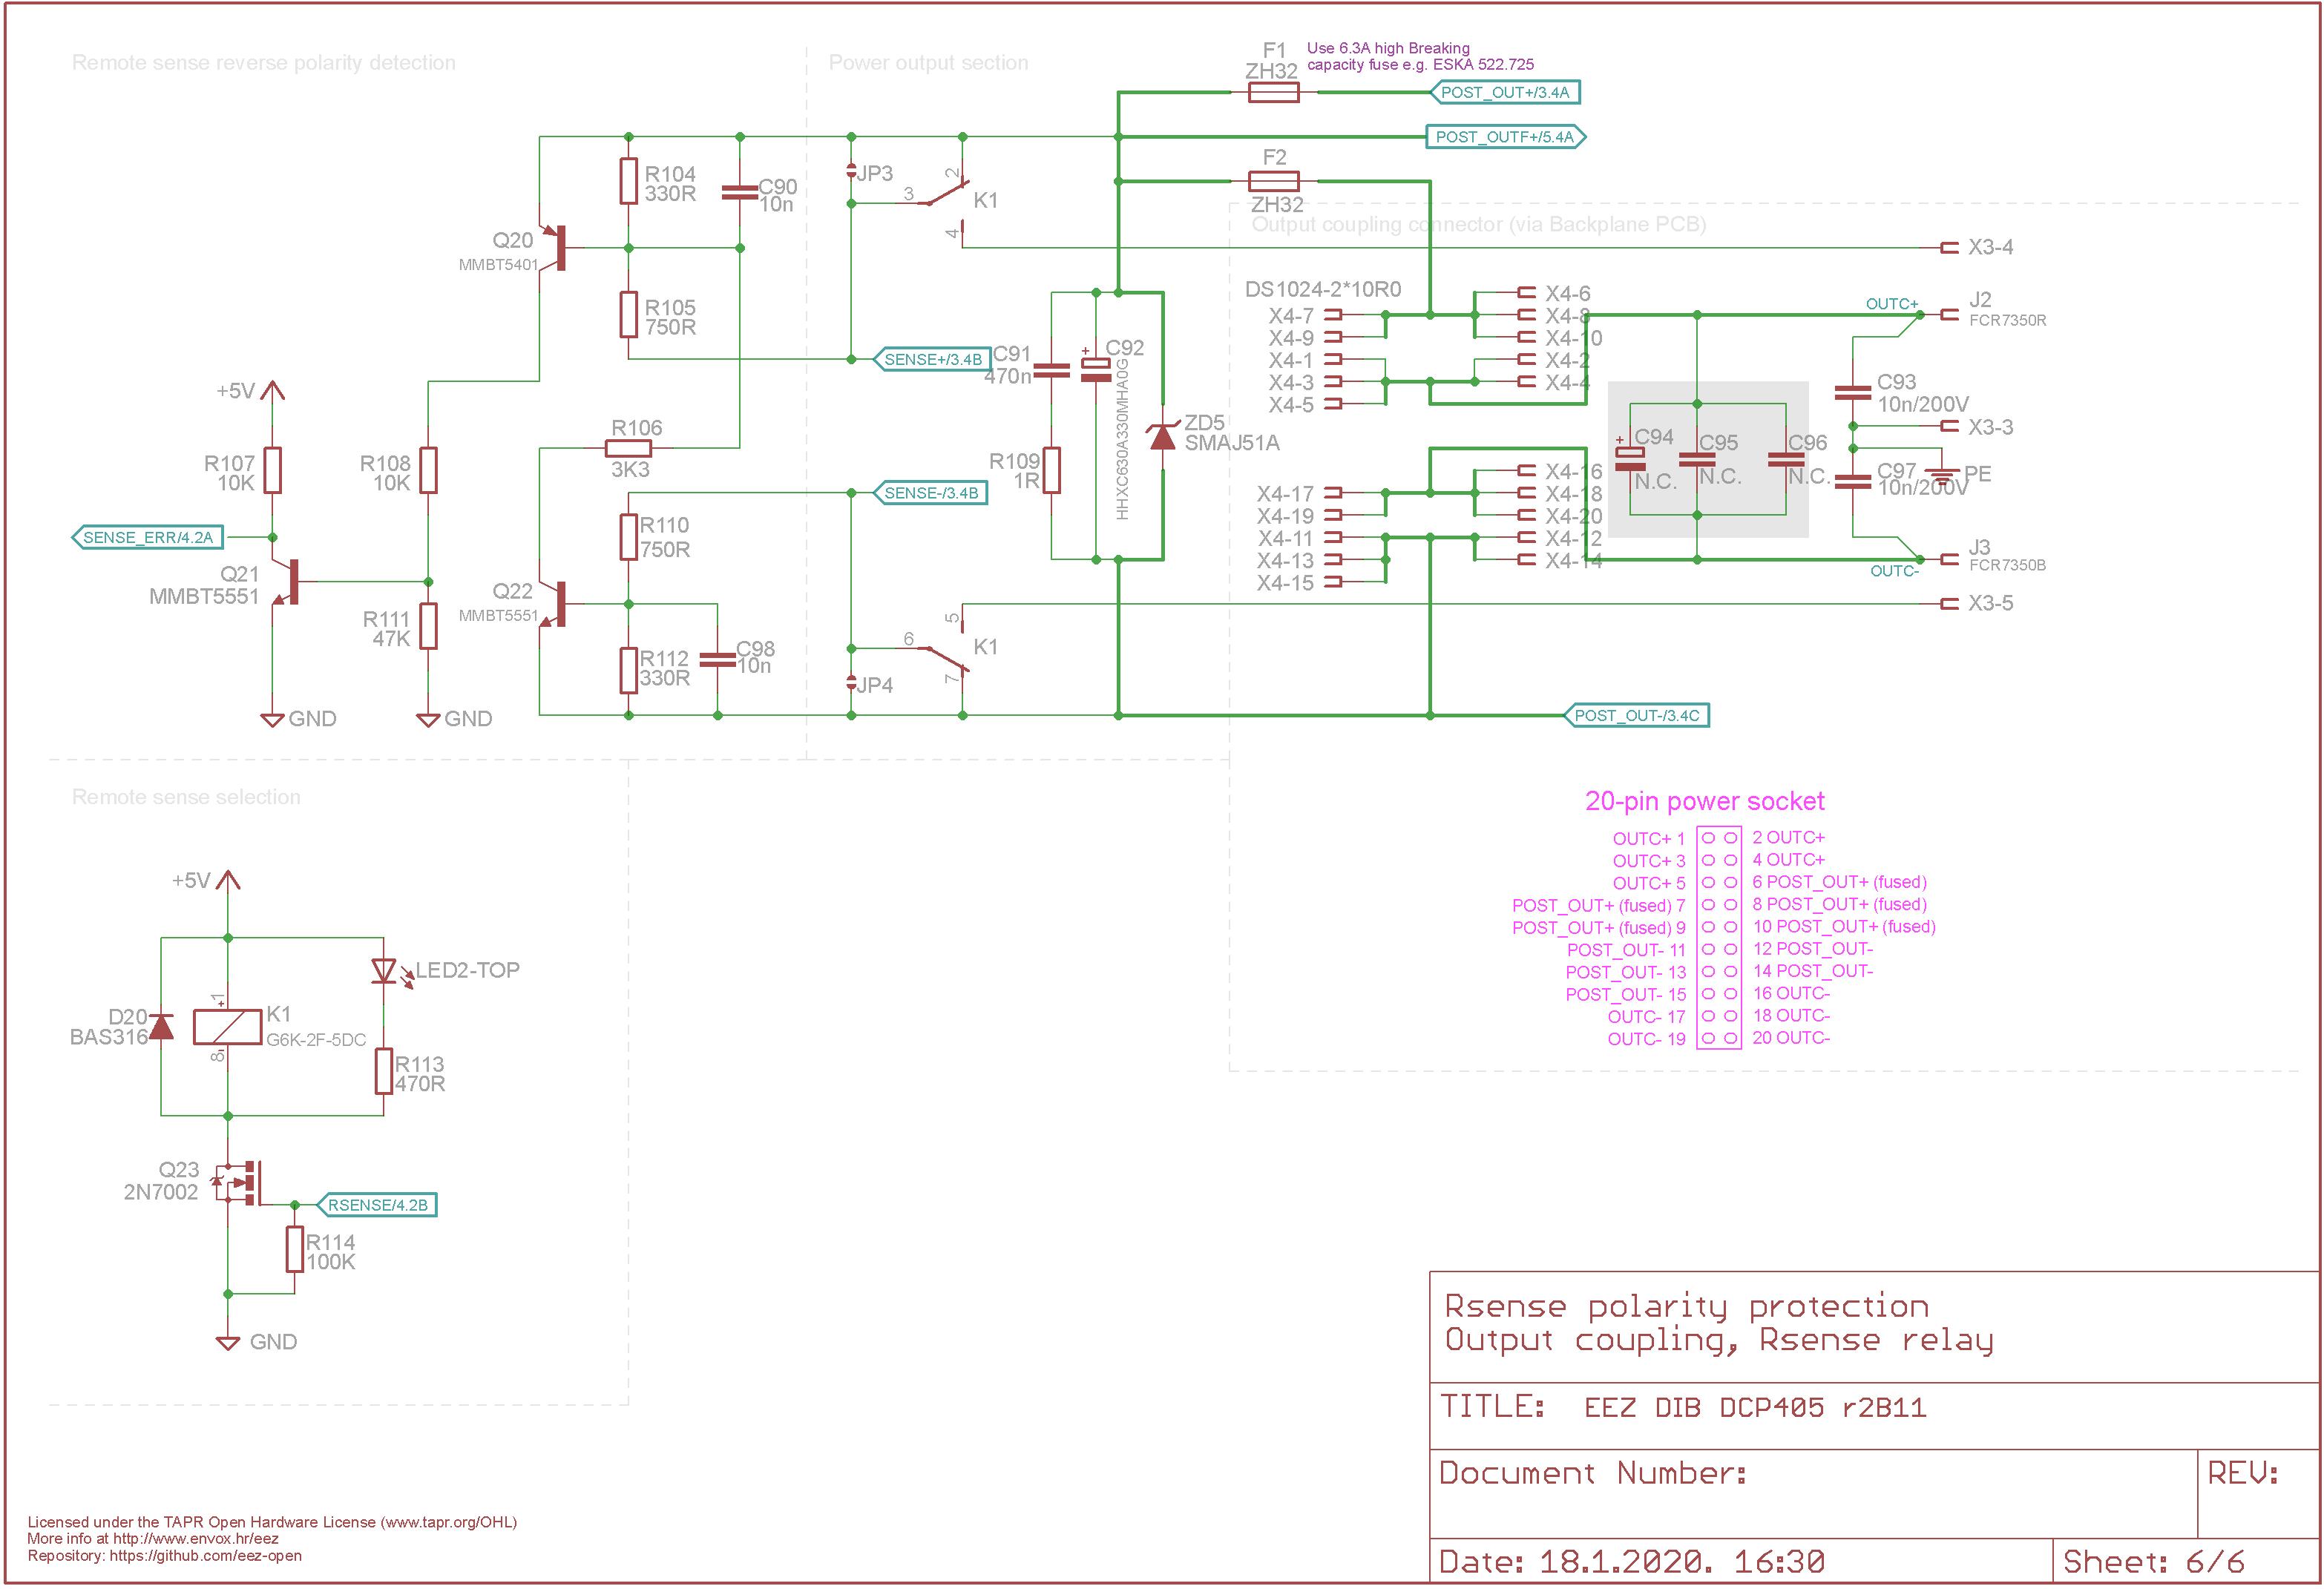 eez_dcp405_r2b11_sheet6of6.png